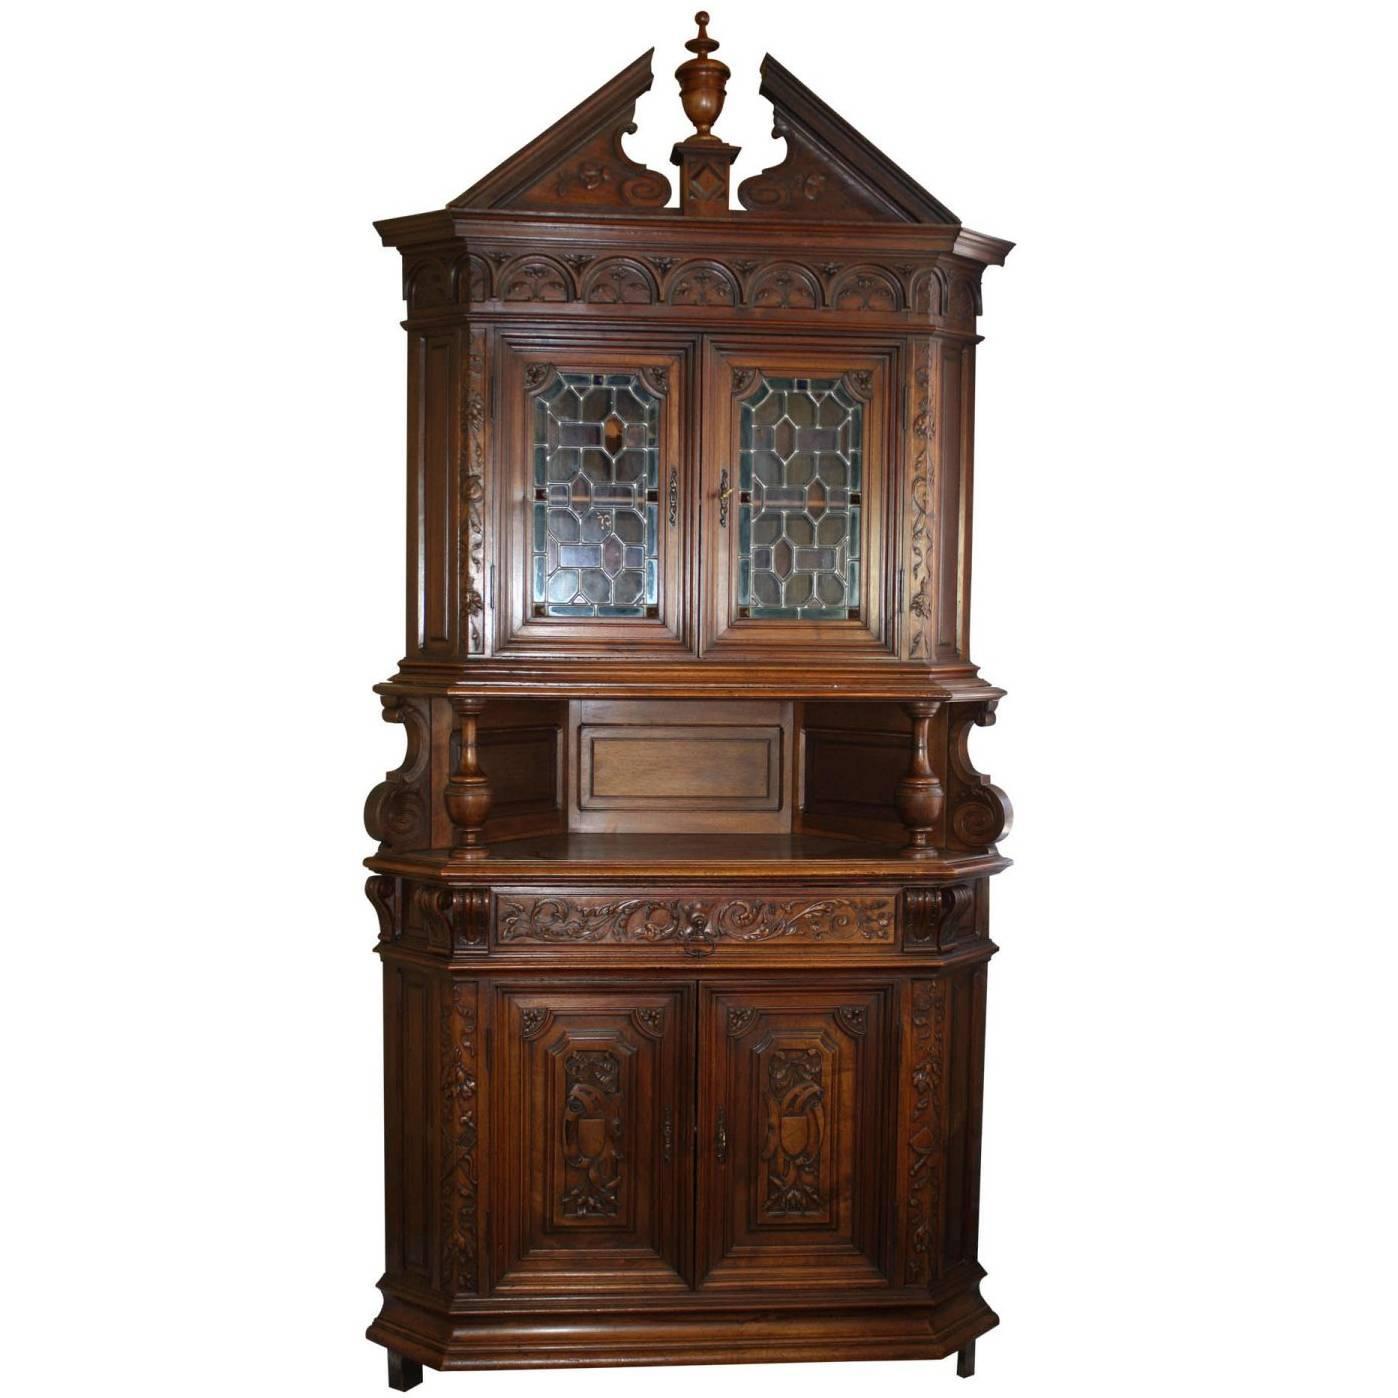 French Walnut Renaissance Revival Corner Cabinet, circa 1875